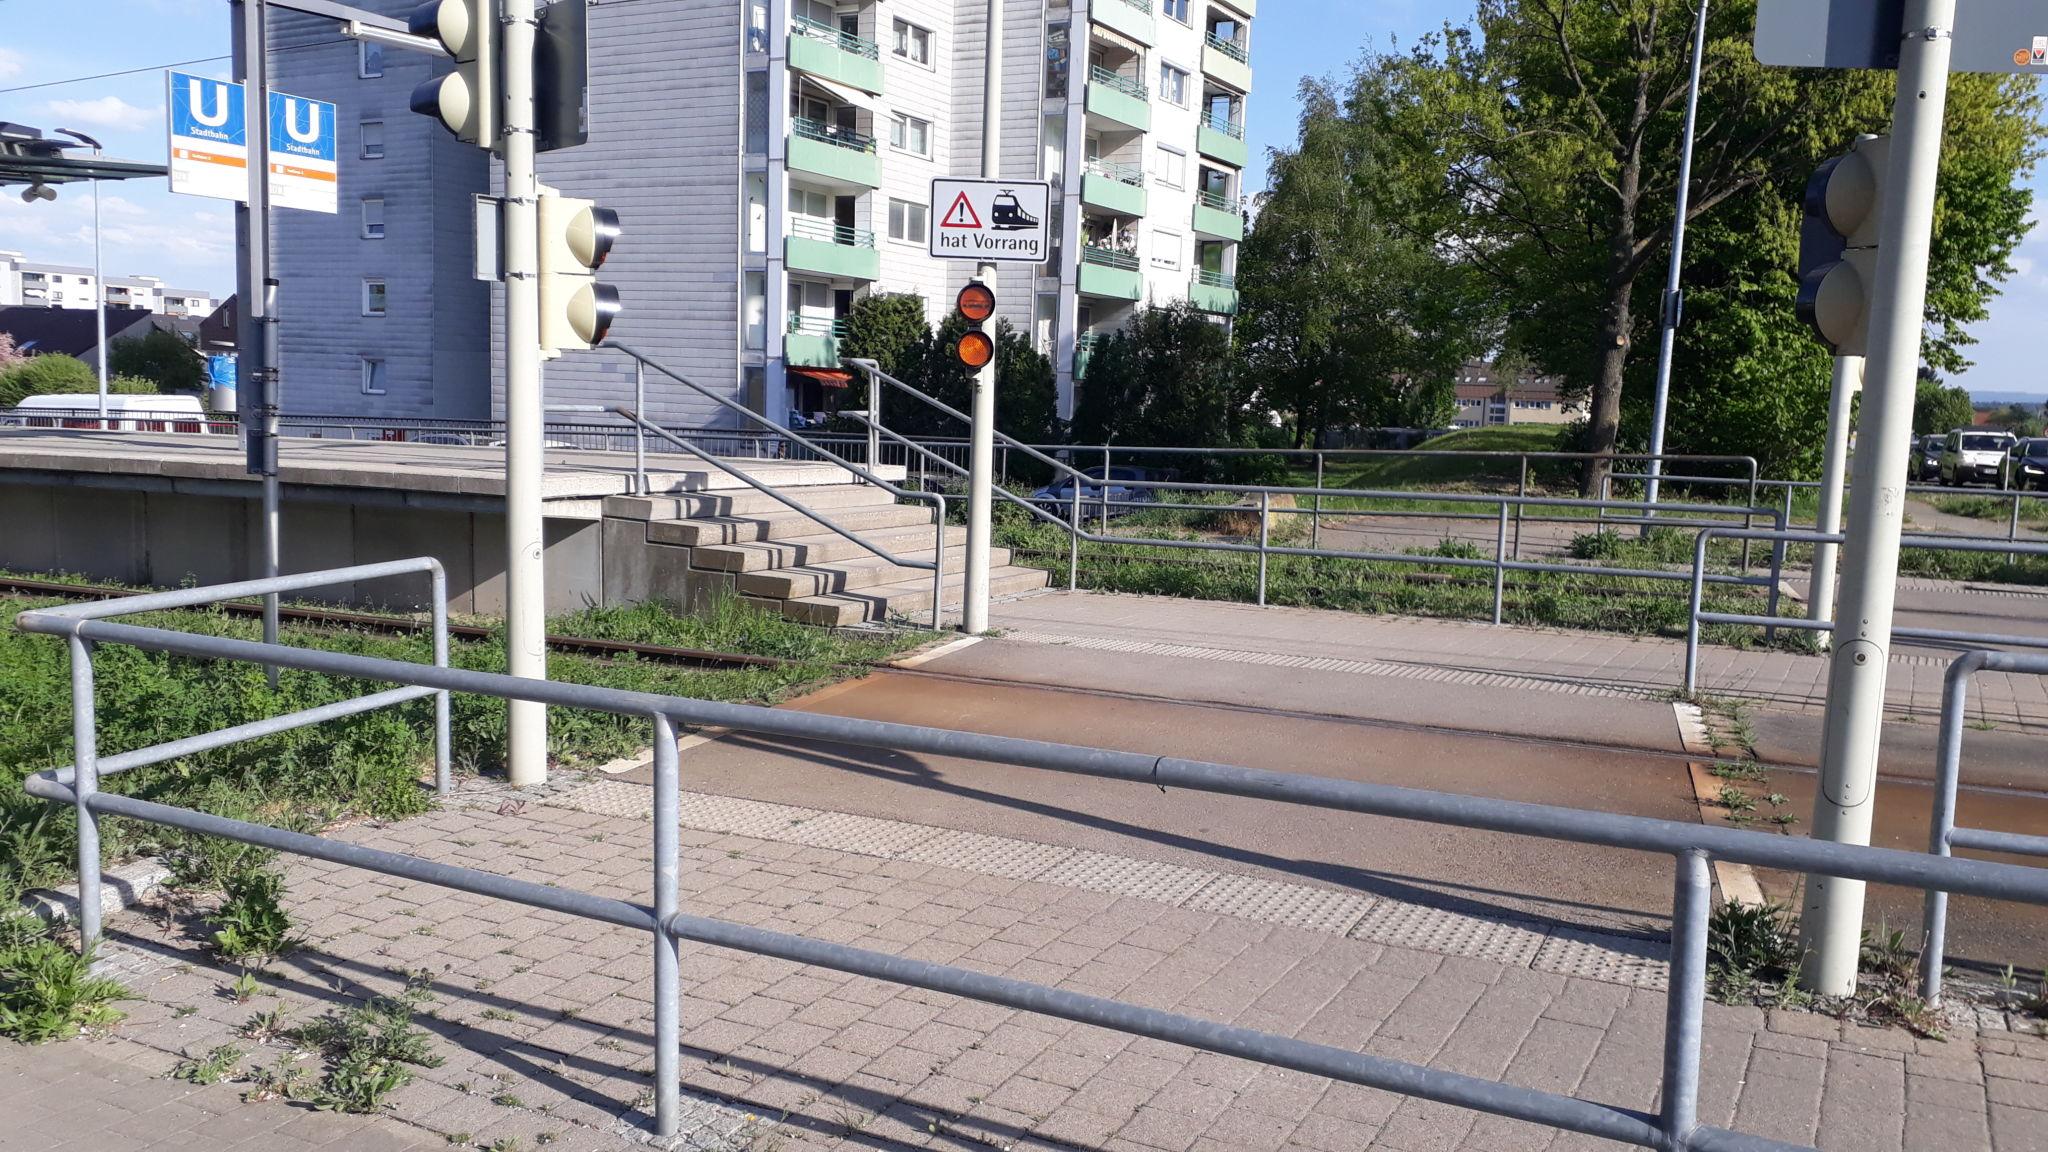 Stadtbahnhaltestelle Techn. Akademie U7 / U8, Nellingen